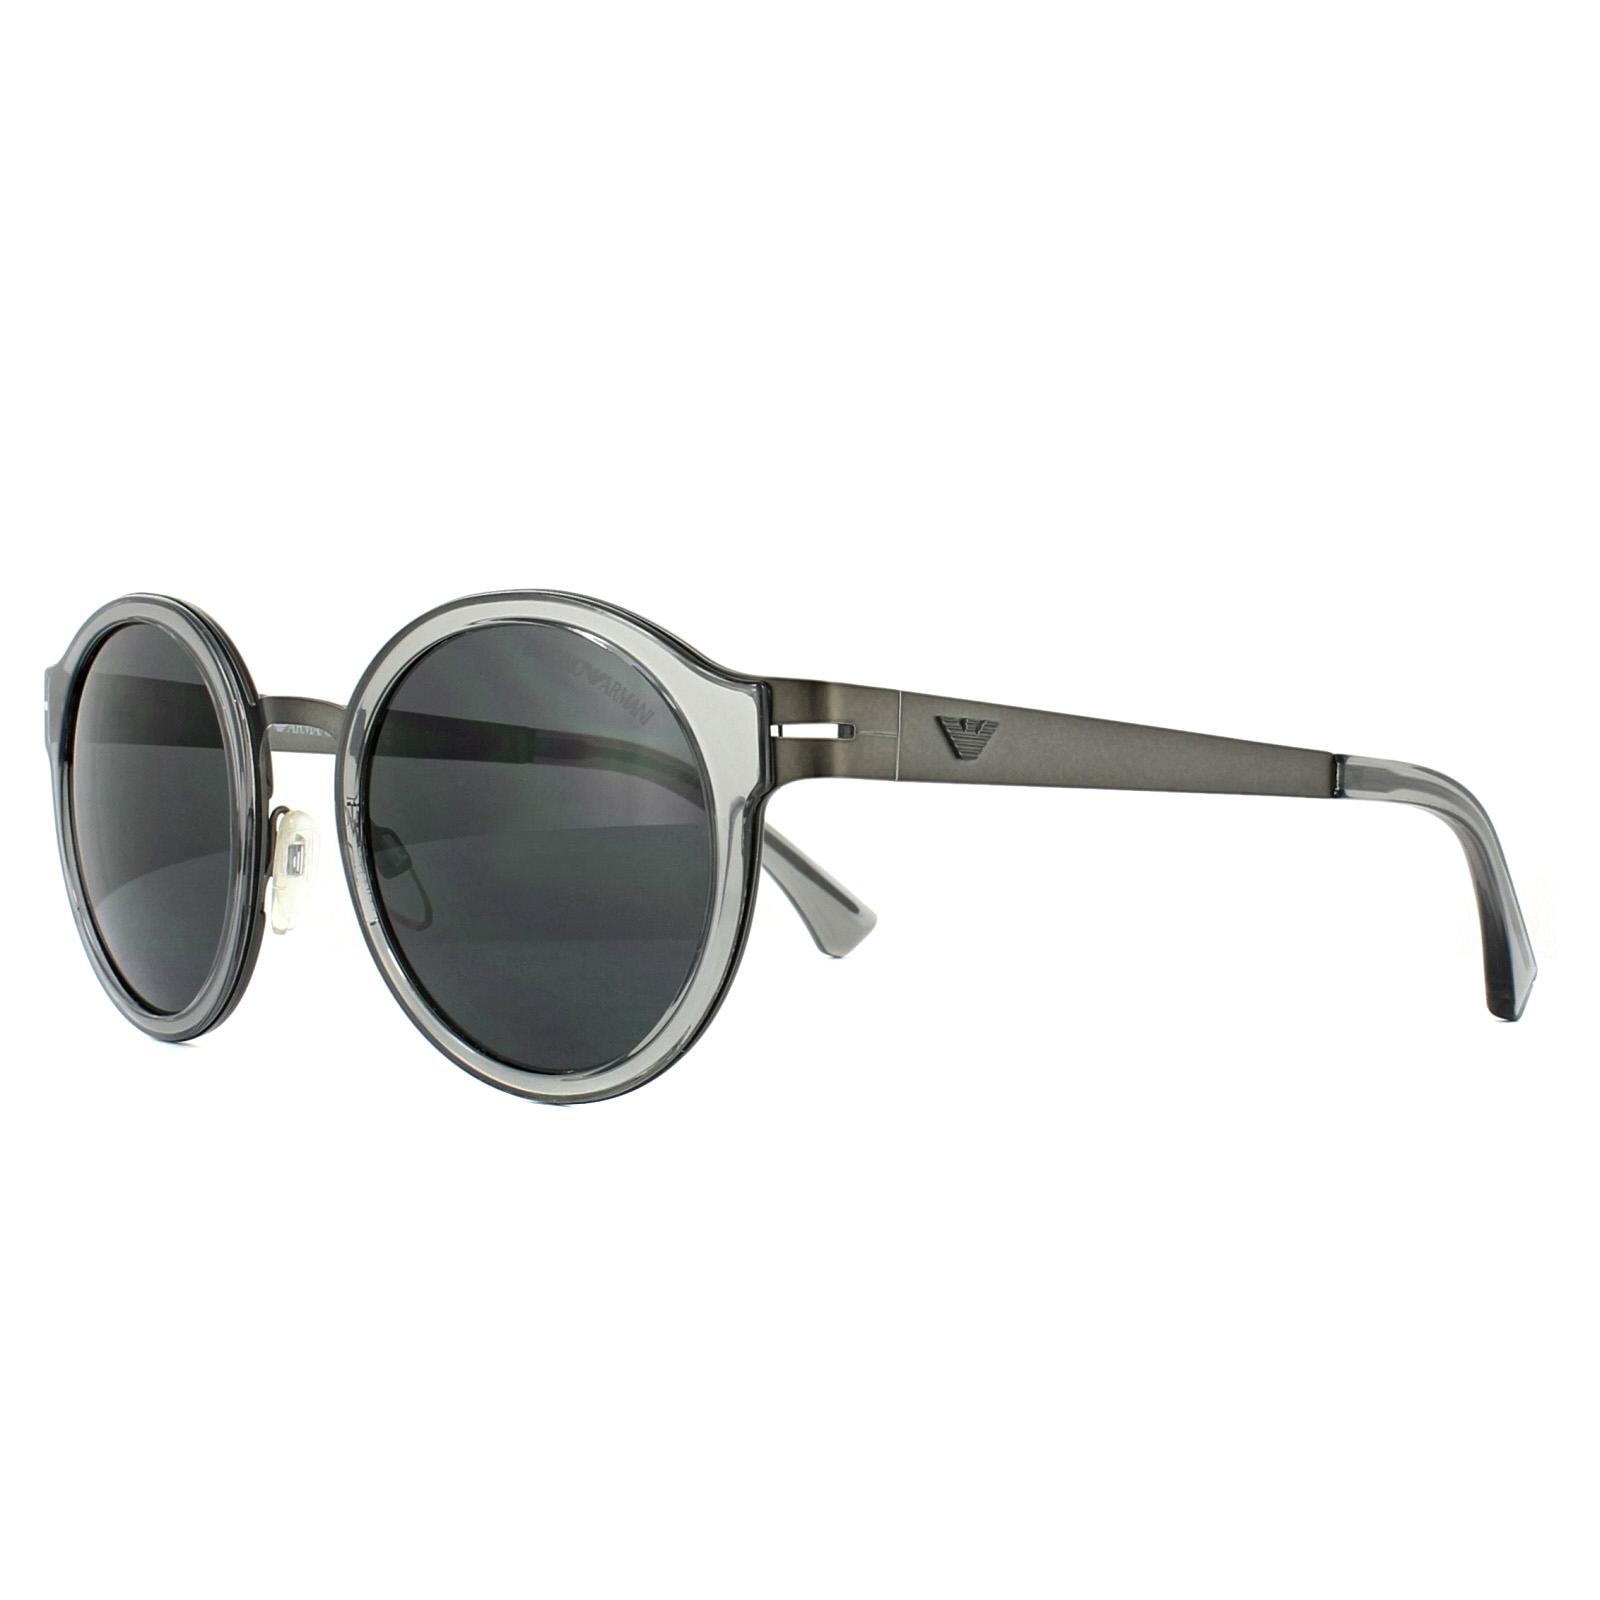 11eb0c0c2039 Sentinel Emporio Armani Sunglasses 2029 300387 Matt Gunmetal Grey